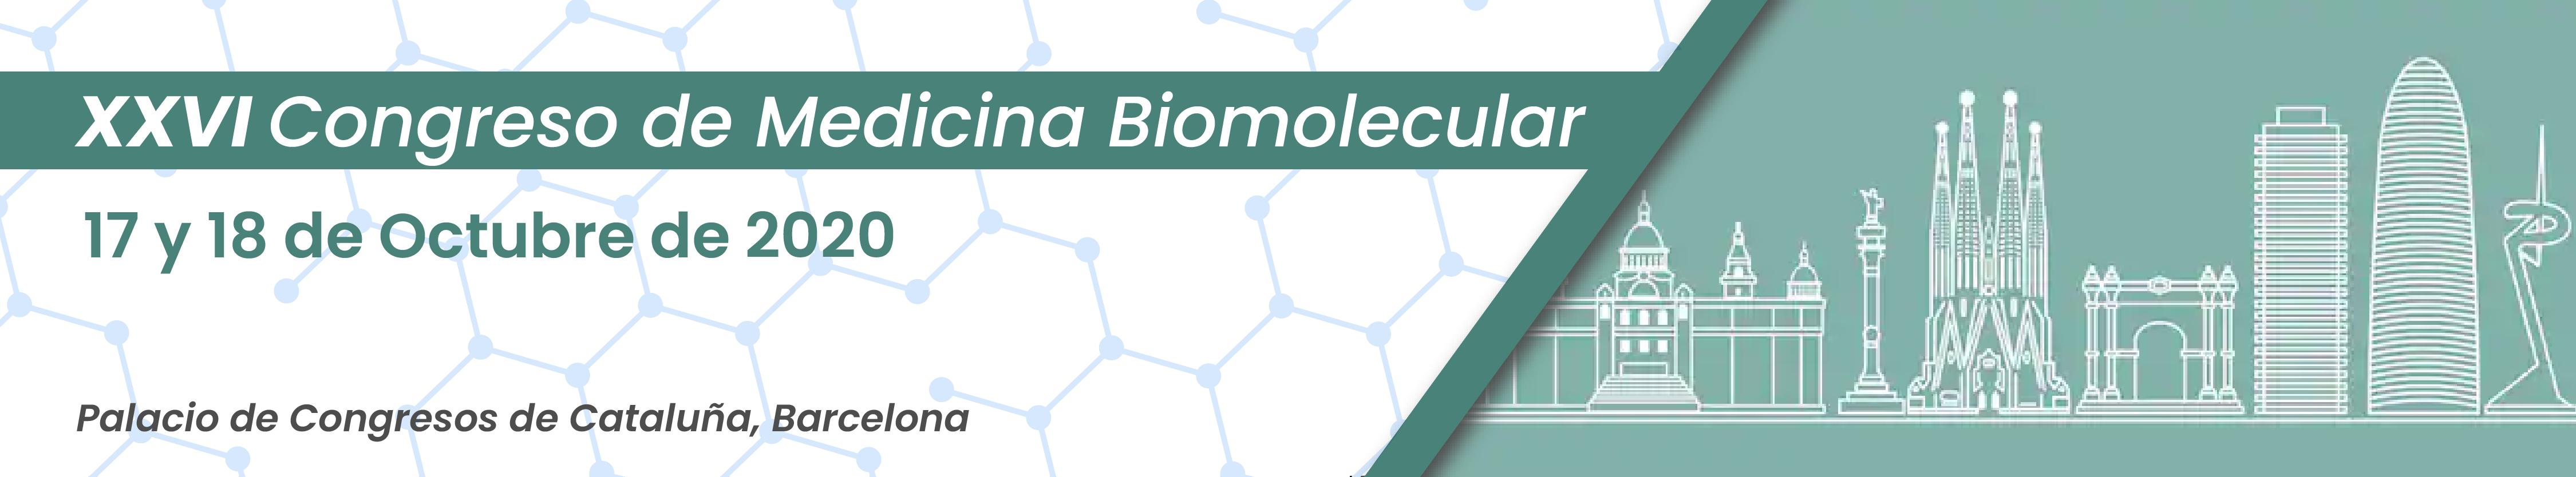 XXVI Congreso de Medicina Biomolecular